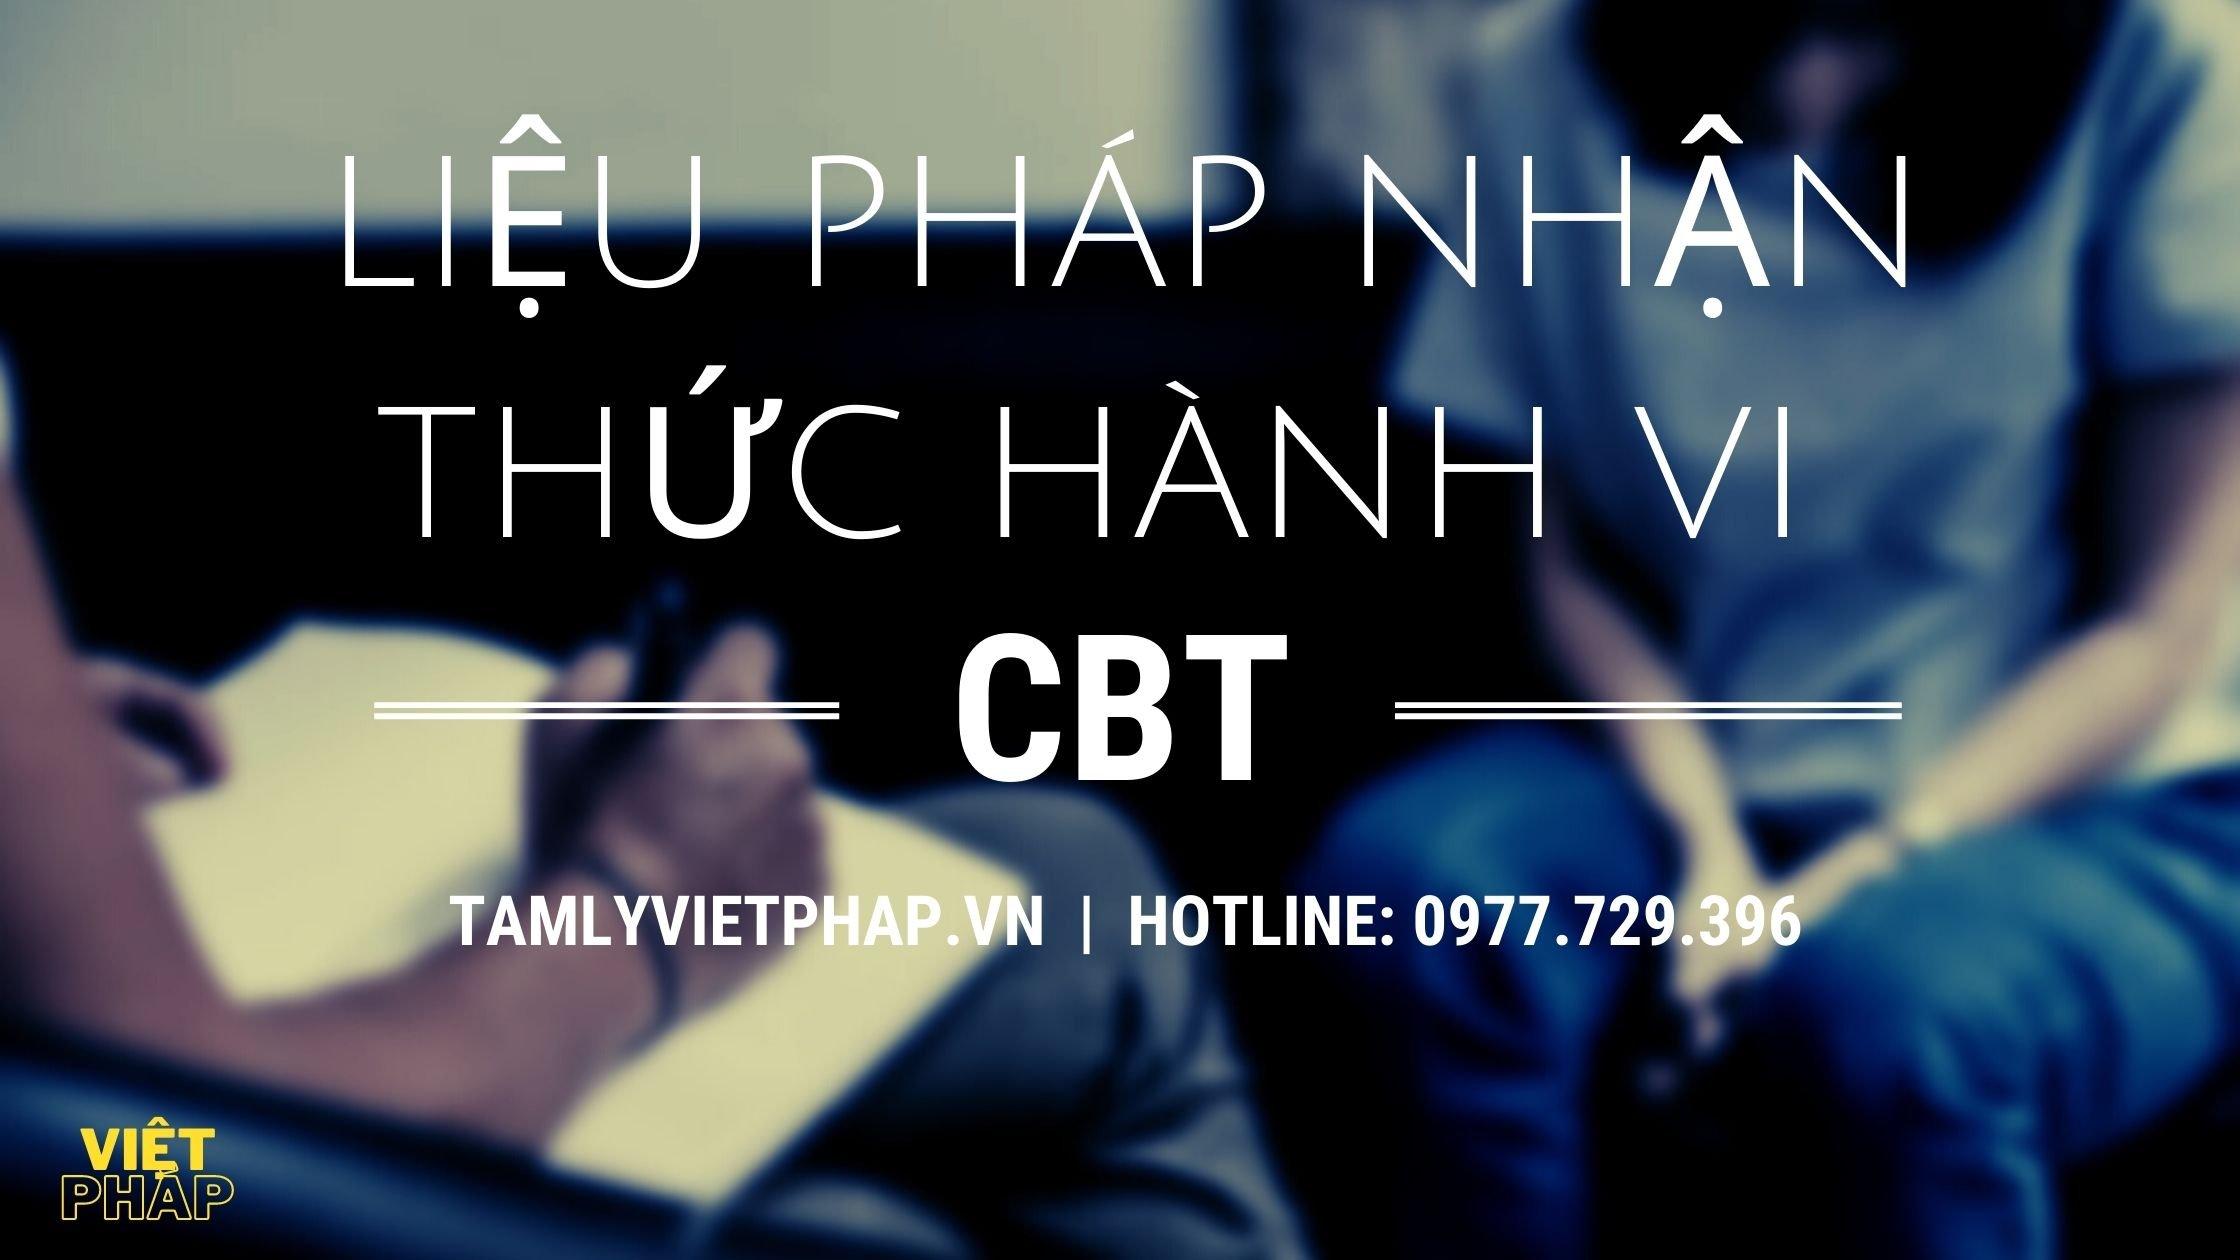 lieu_phap_nhan_thuc_hanh_vi